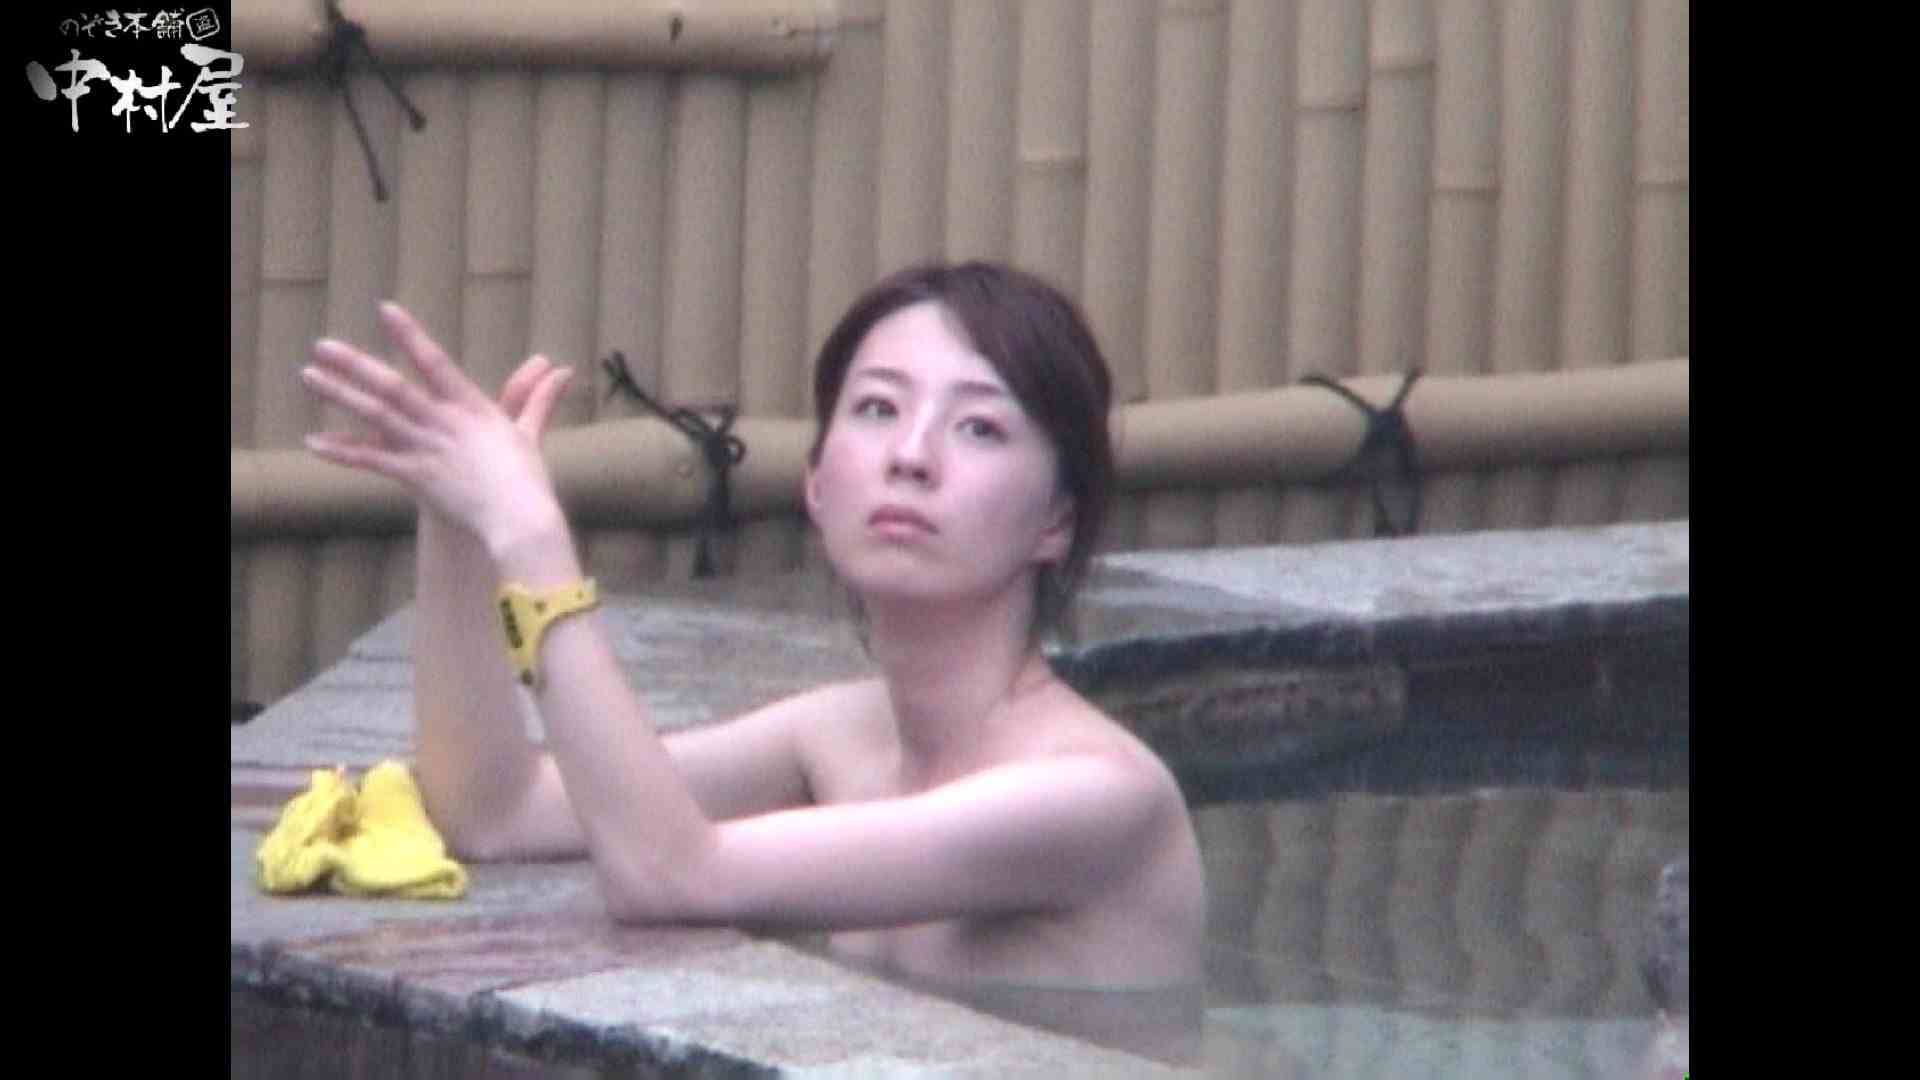 Aquaな露天風呂Vol.964 綺麗なOLたち オメコ無修正動画無料 97枚 35